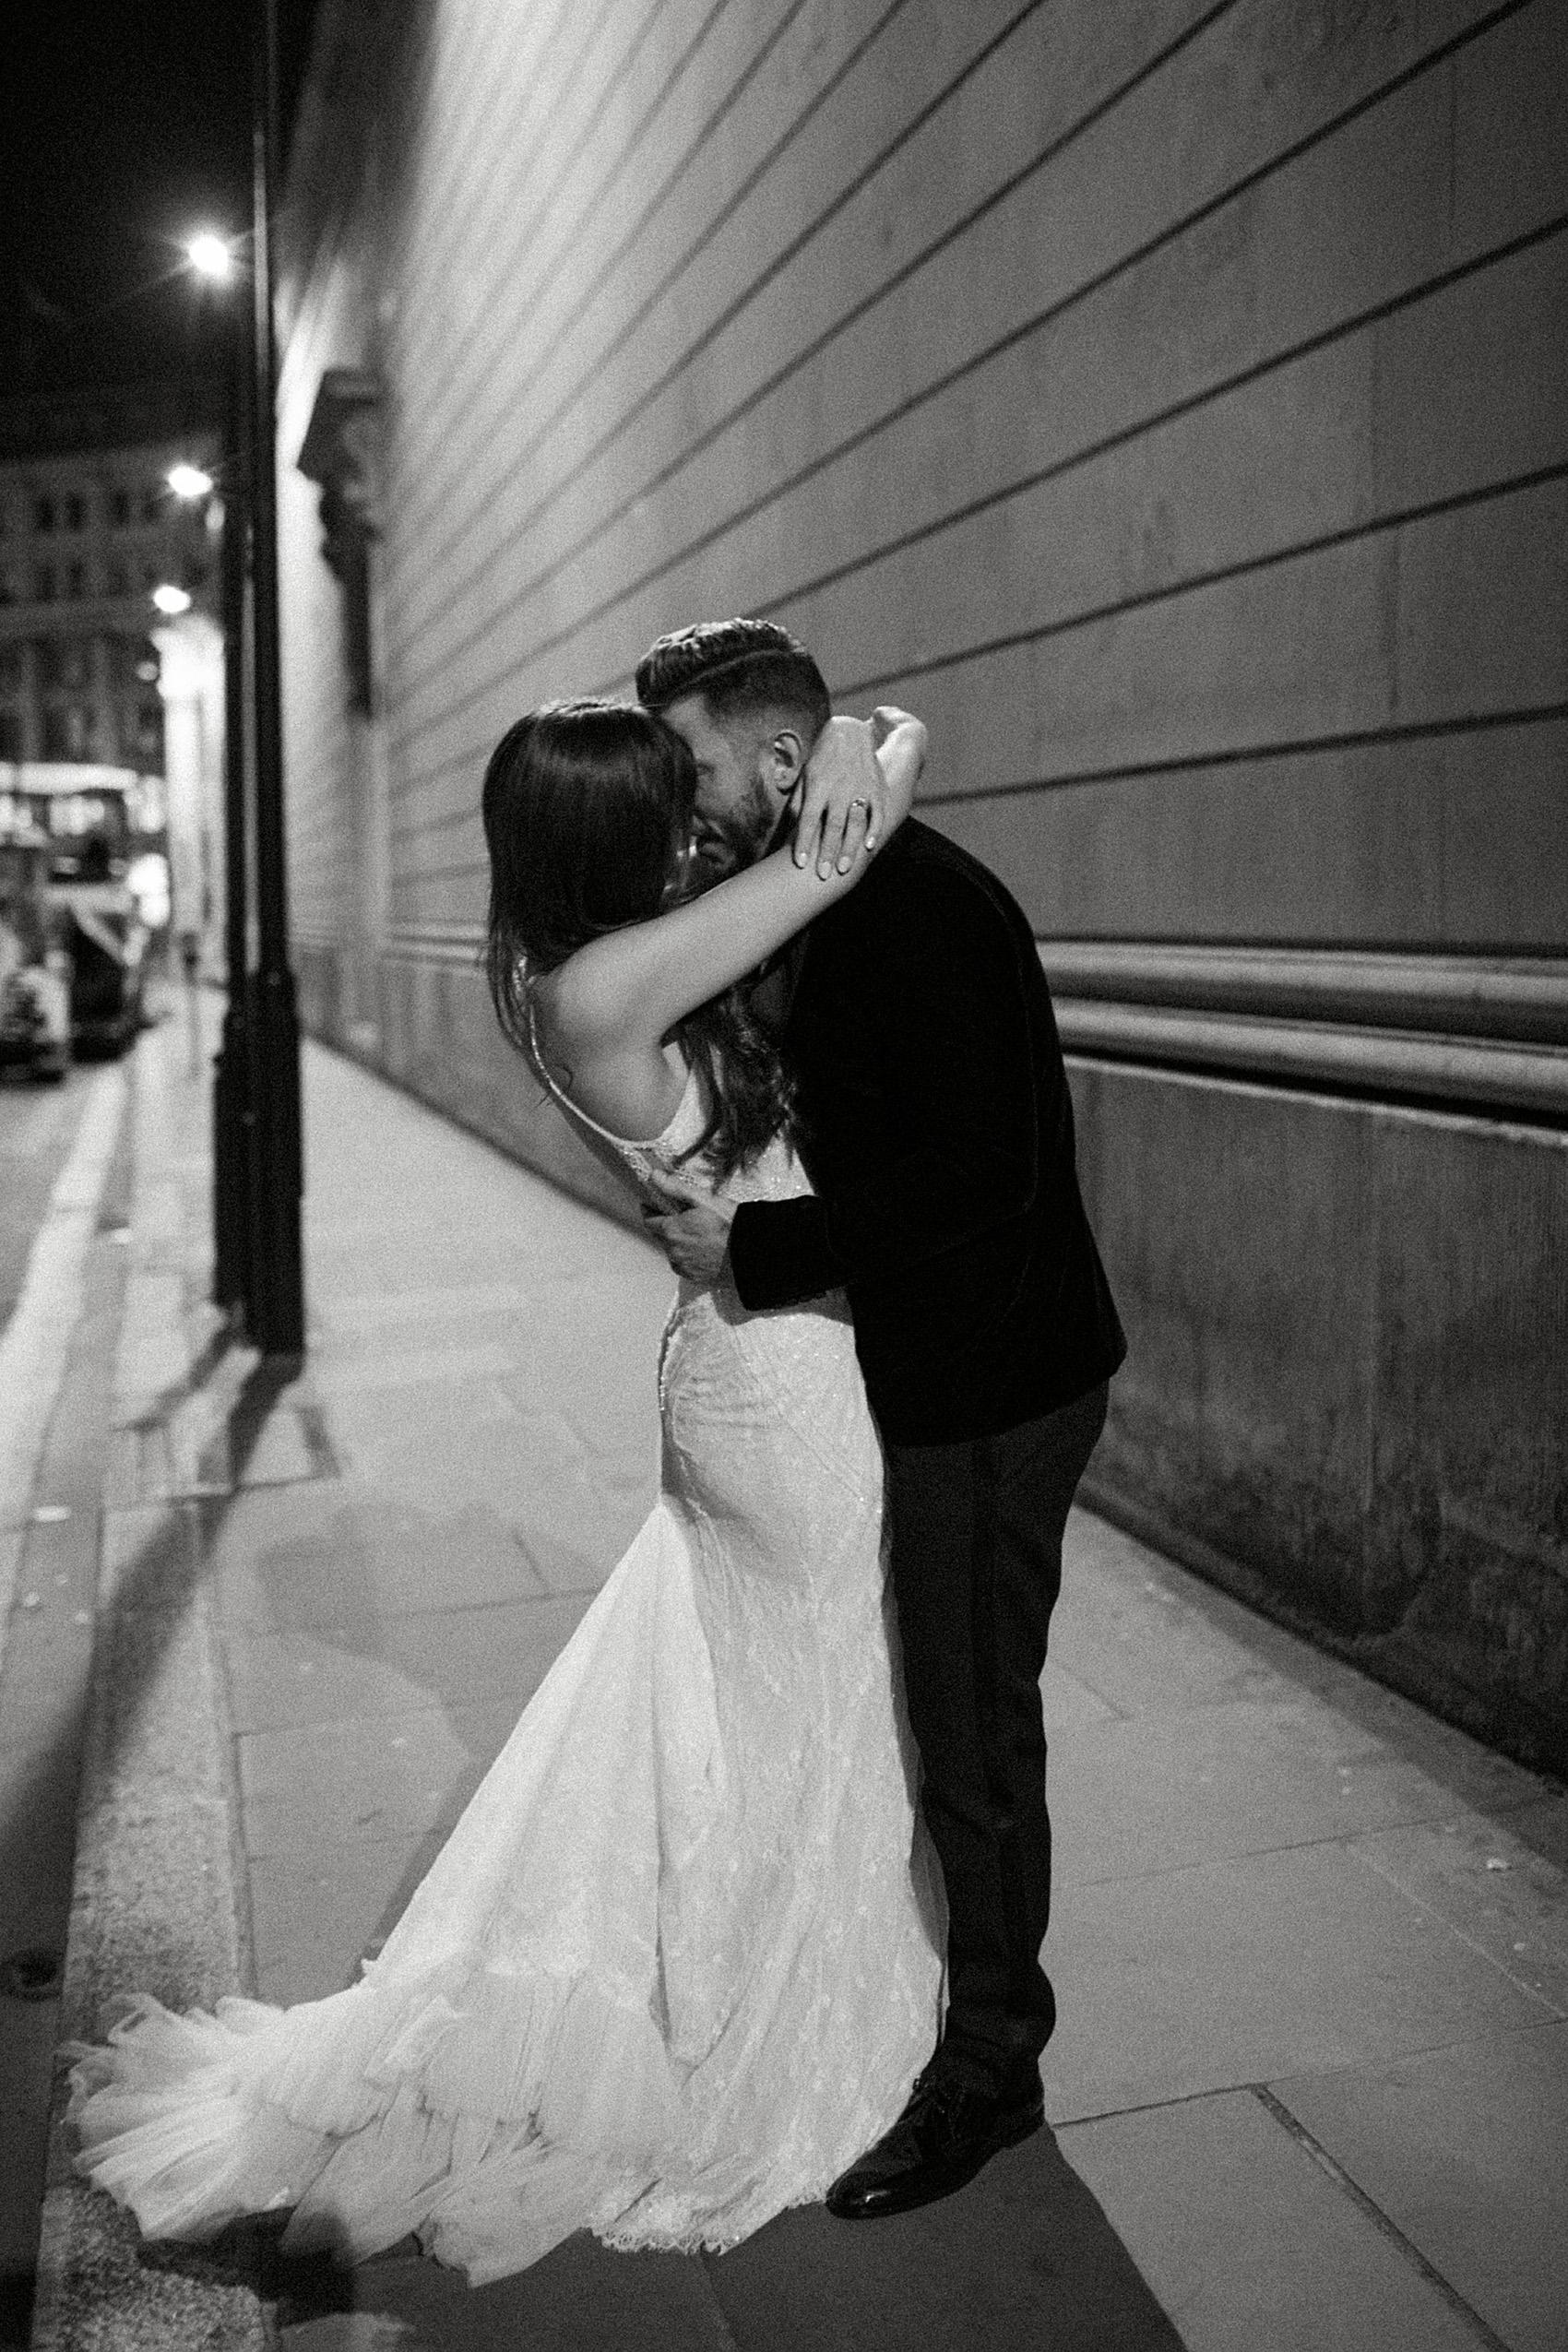 Romantic night portrait of bride and groom